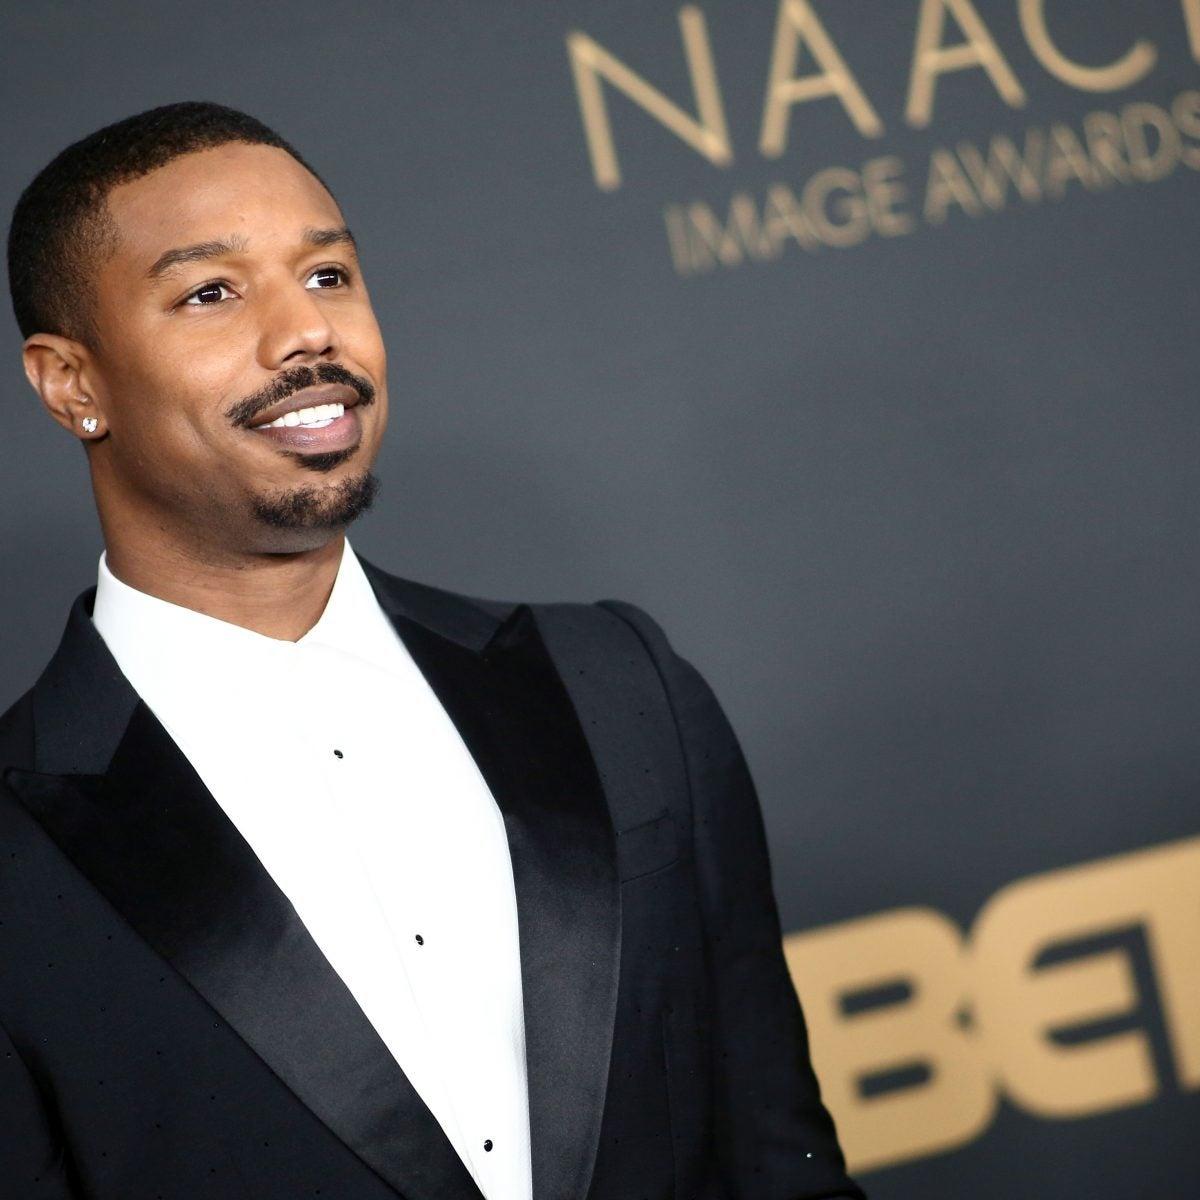 Michael B. Jordan Is Bringing Black Movies To Drive-Ins